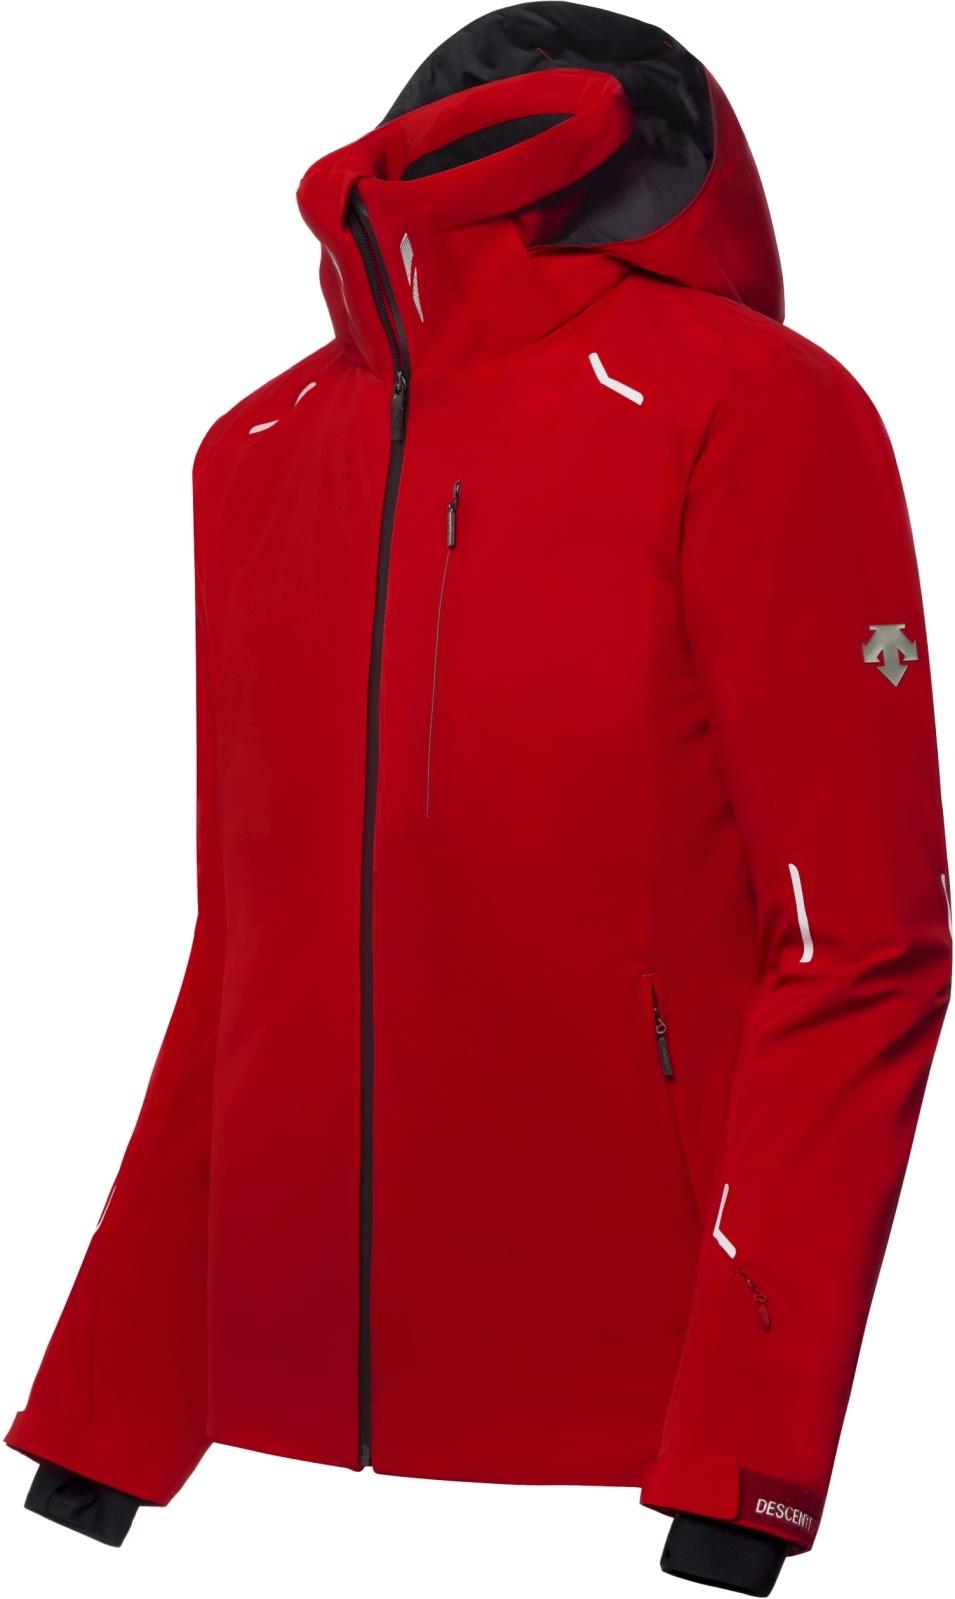 Descente Regal - electric red XL